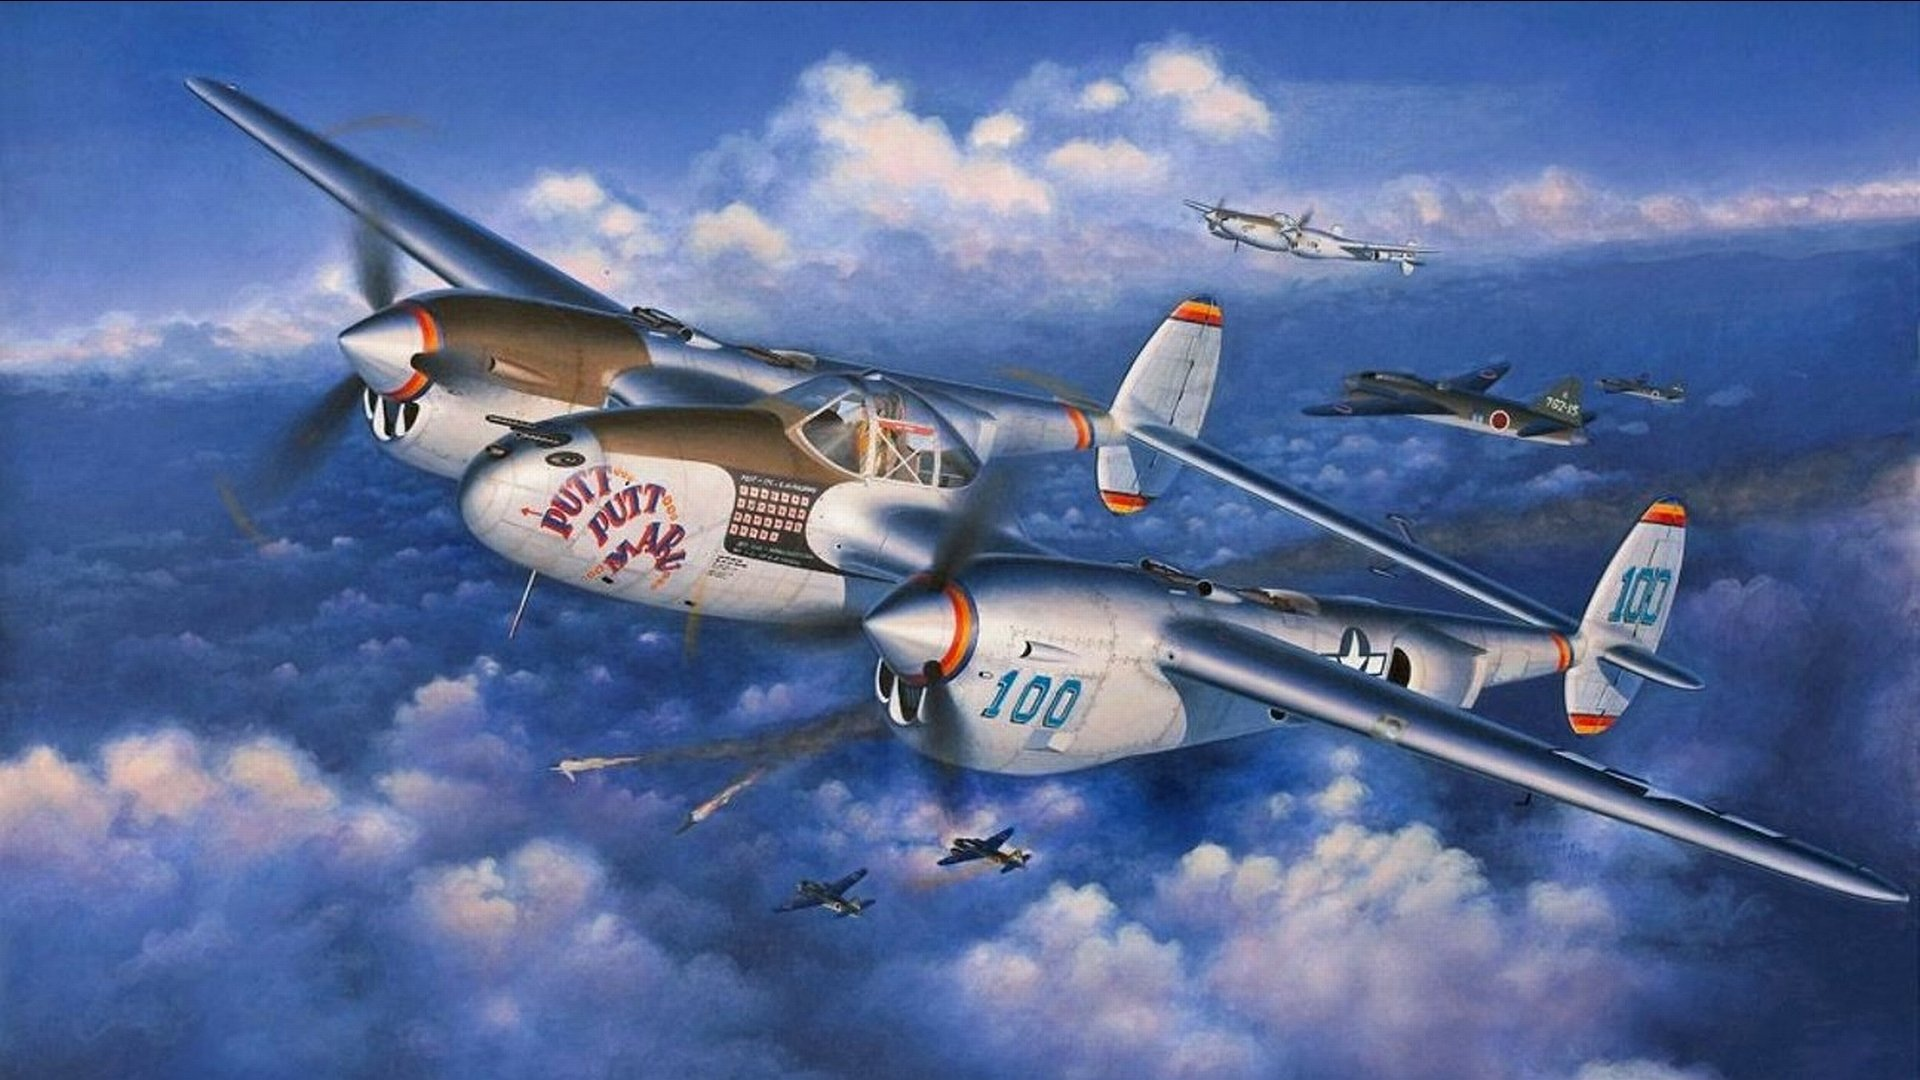 P 38 Lightning Wallpaper A squadron of P-38 Lig...